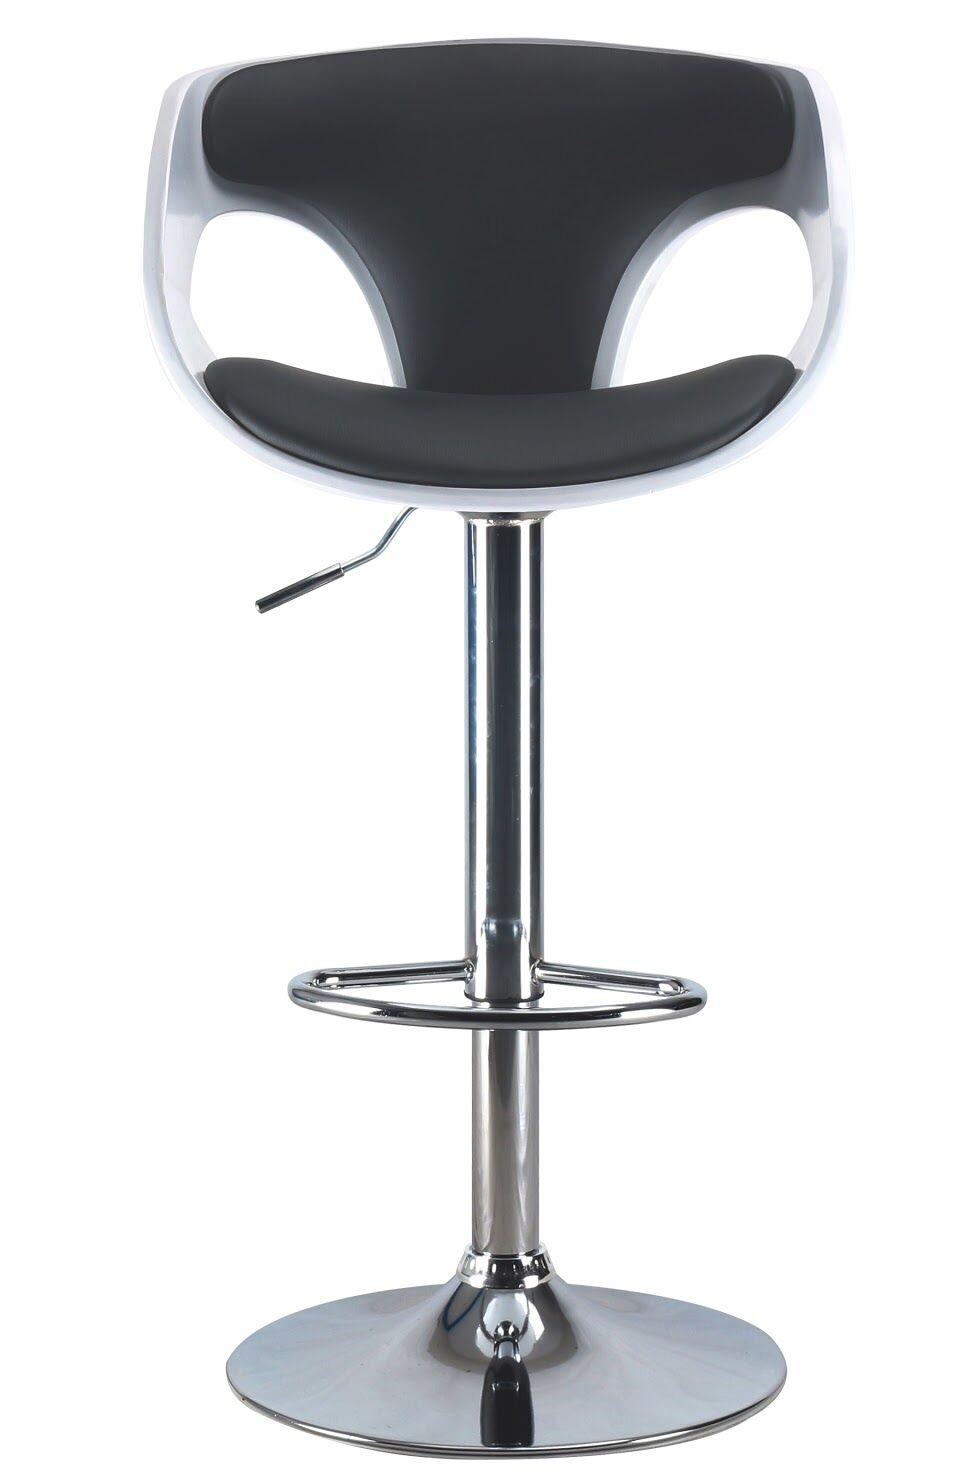 Brisa Mid Century Modern Adjustable Height Swivel Bar Stool Color: Chrome/Gray